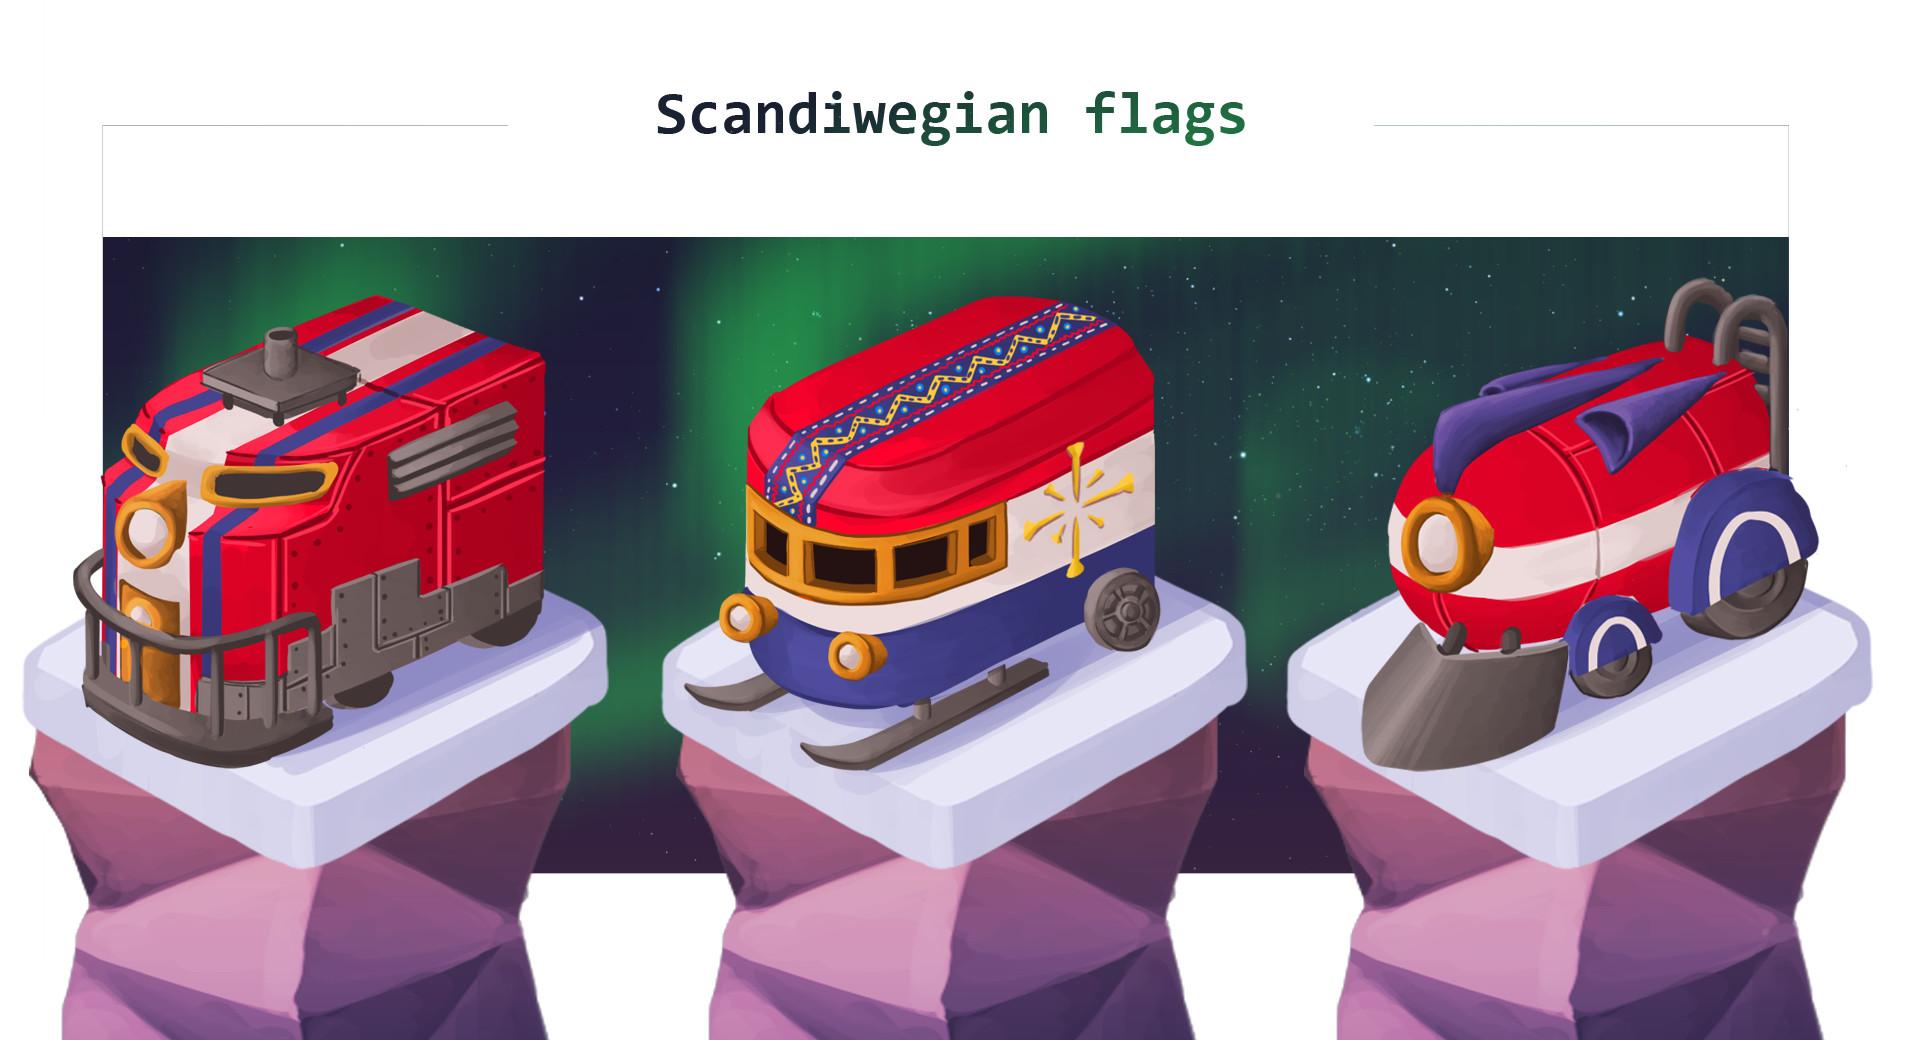 Helen o dell arctic trains scandi